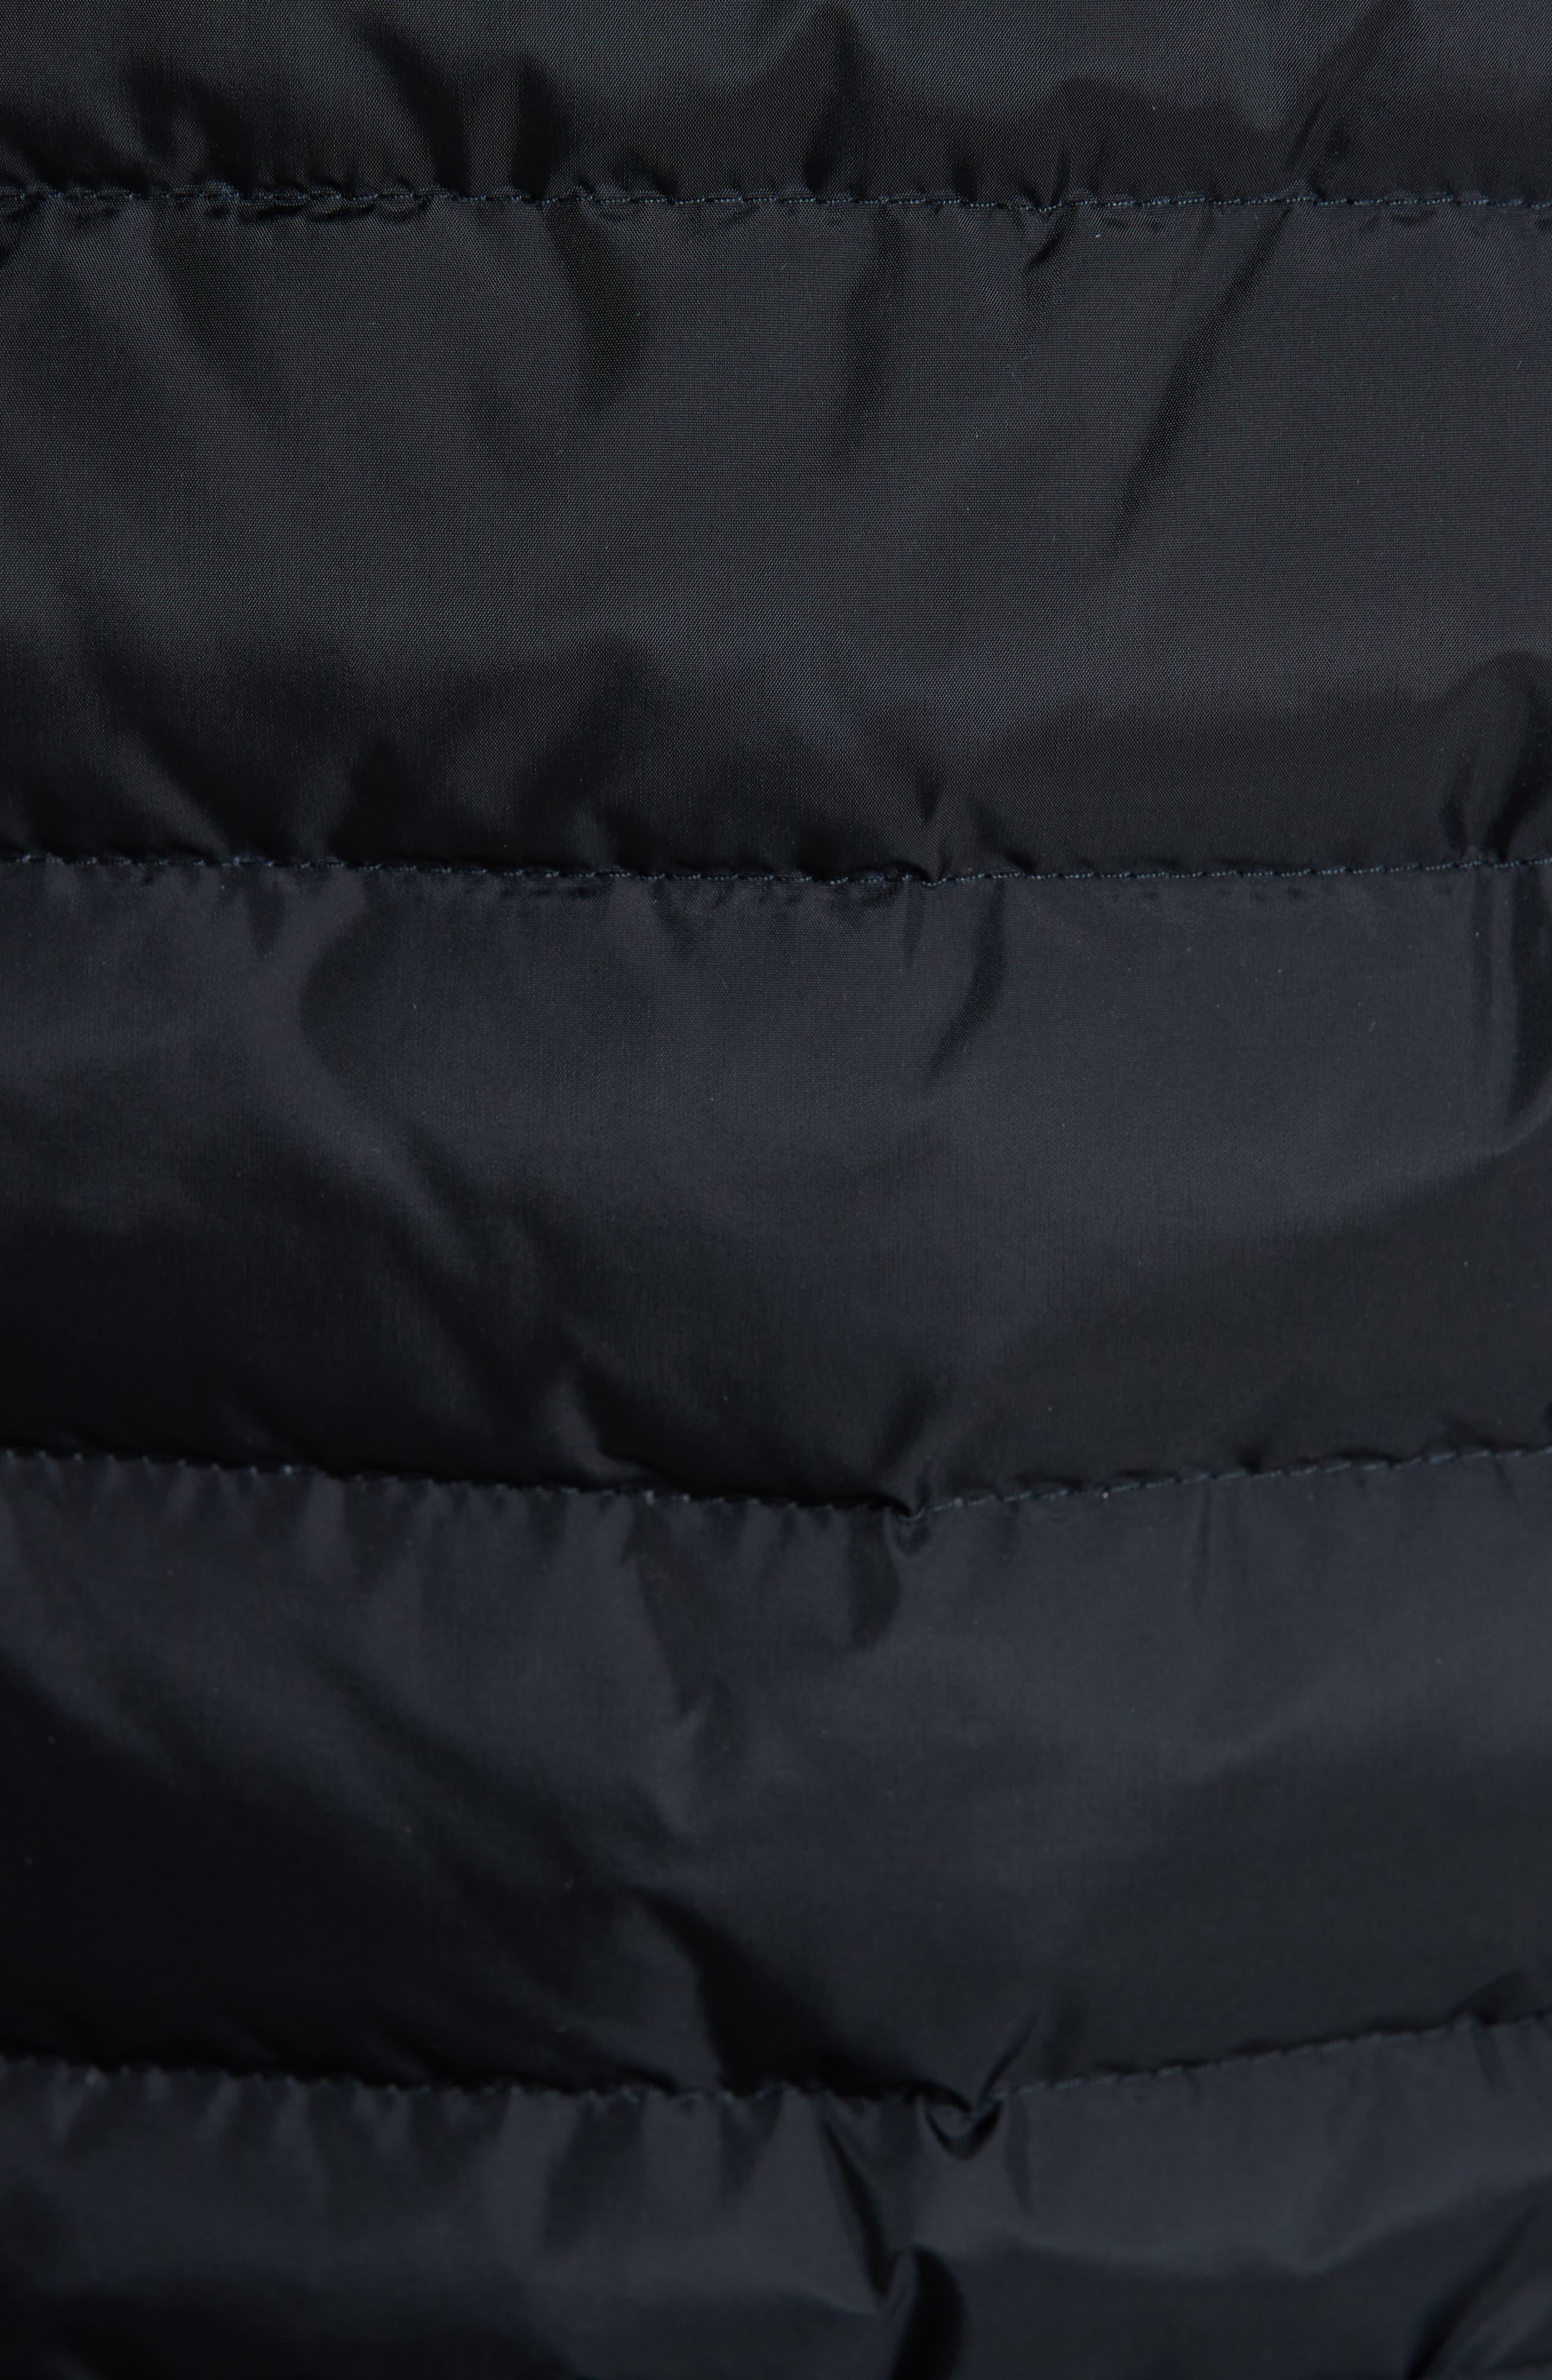 MONCLER, Beverley Genuine Fox Fur Trim Quilted Down Coat, Alternate thumbnail 6, color, 001